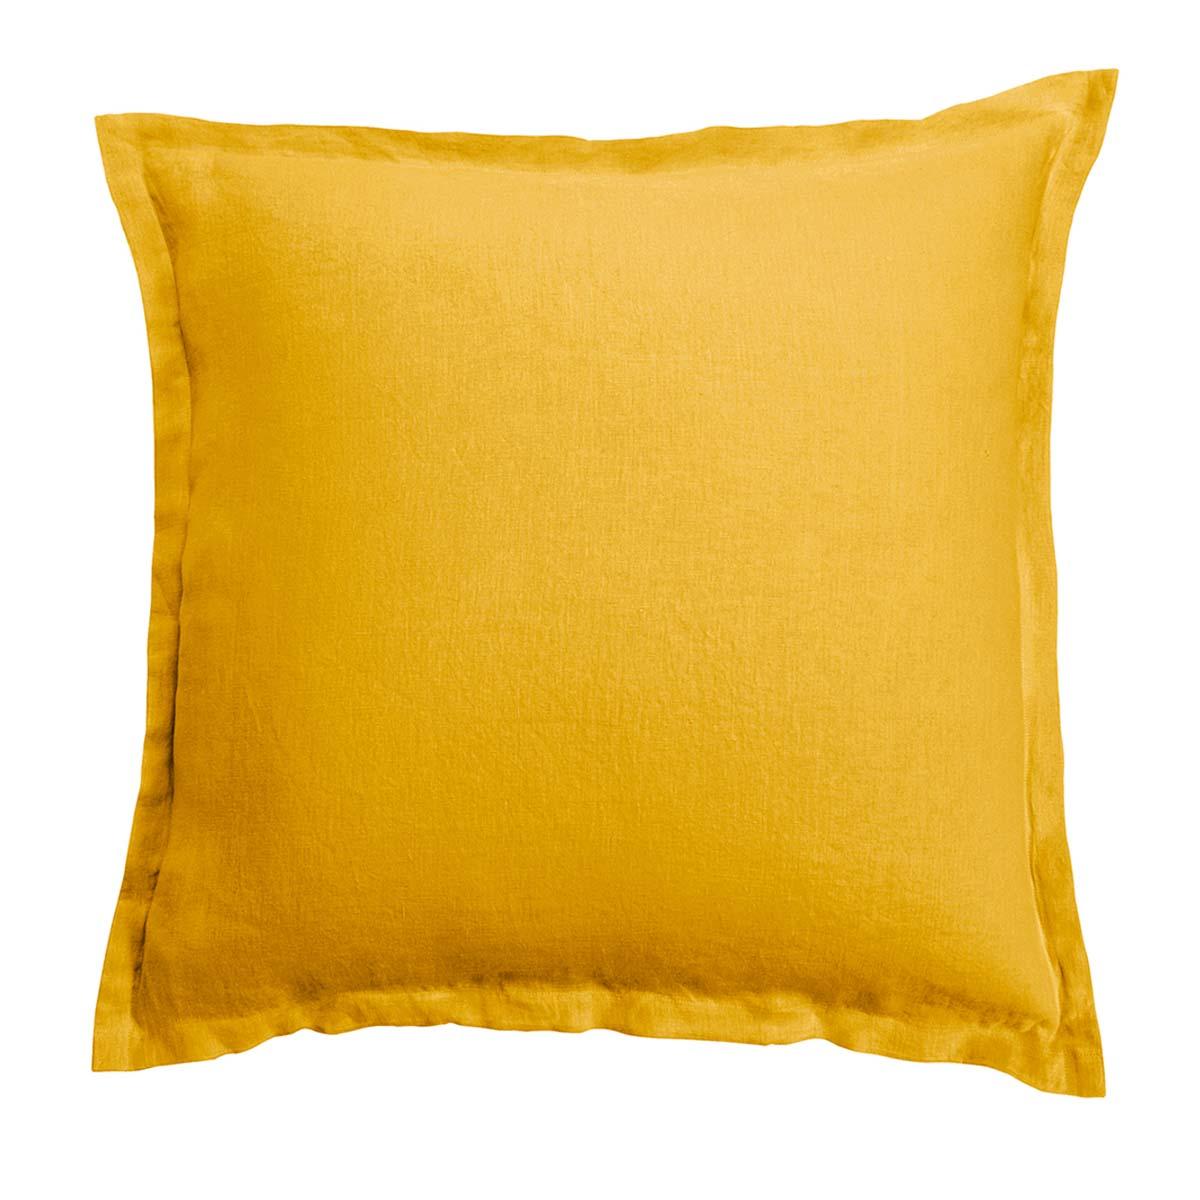 Anne de Solne Taie d'oreiller lin 65x65 cm miel